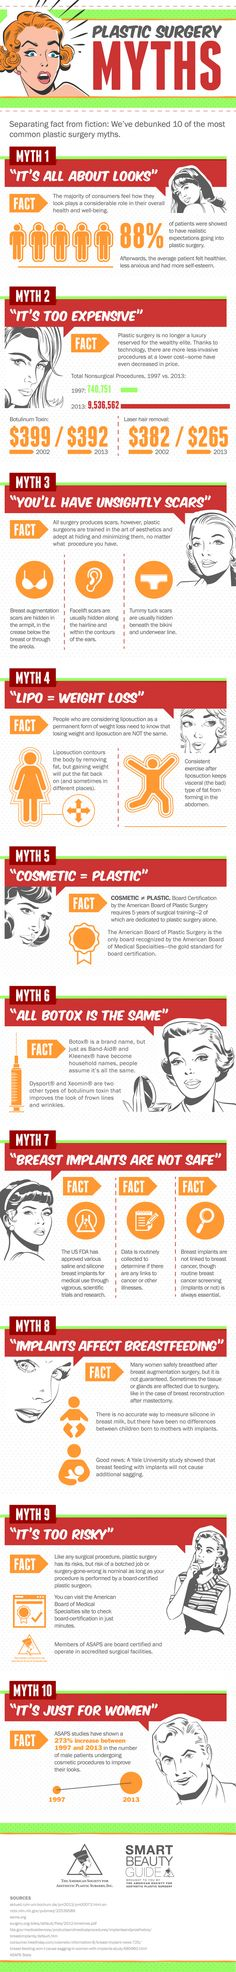 Top 10 plastic surgery myths: Fact vs. fiction [INFOGRAPHIC] #plasticsurgery